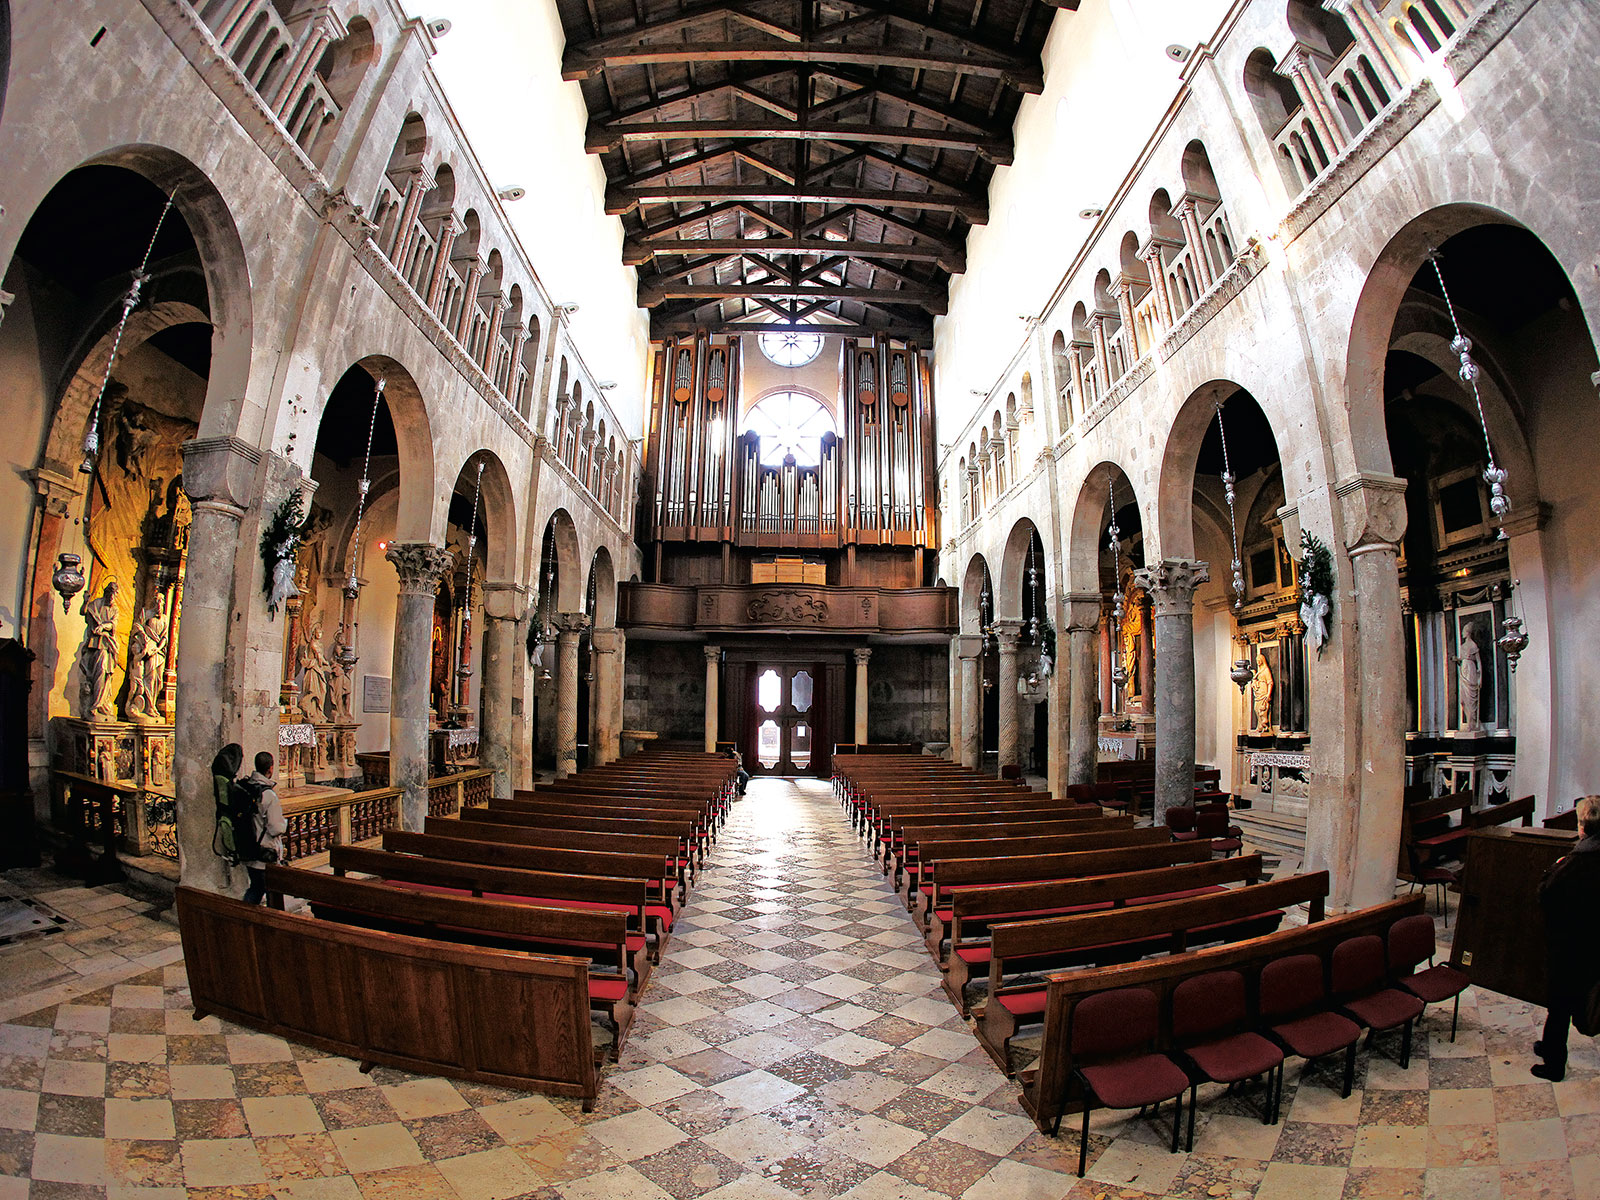 Musica Nota Grad Zadar TZG Zadra katedrala Sveta Stošija